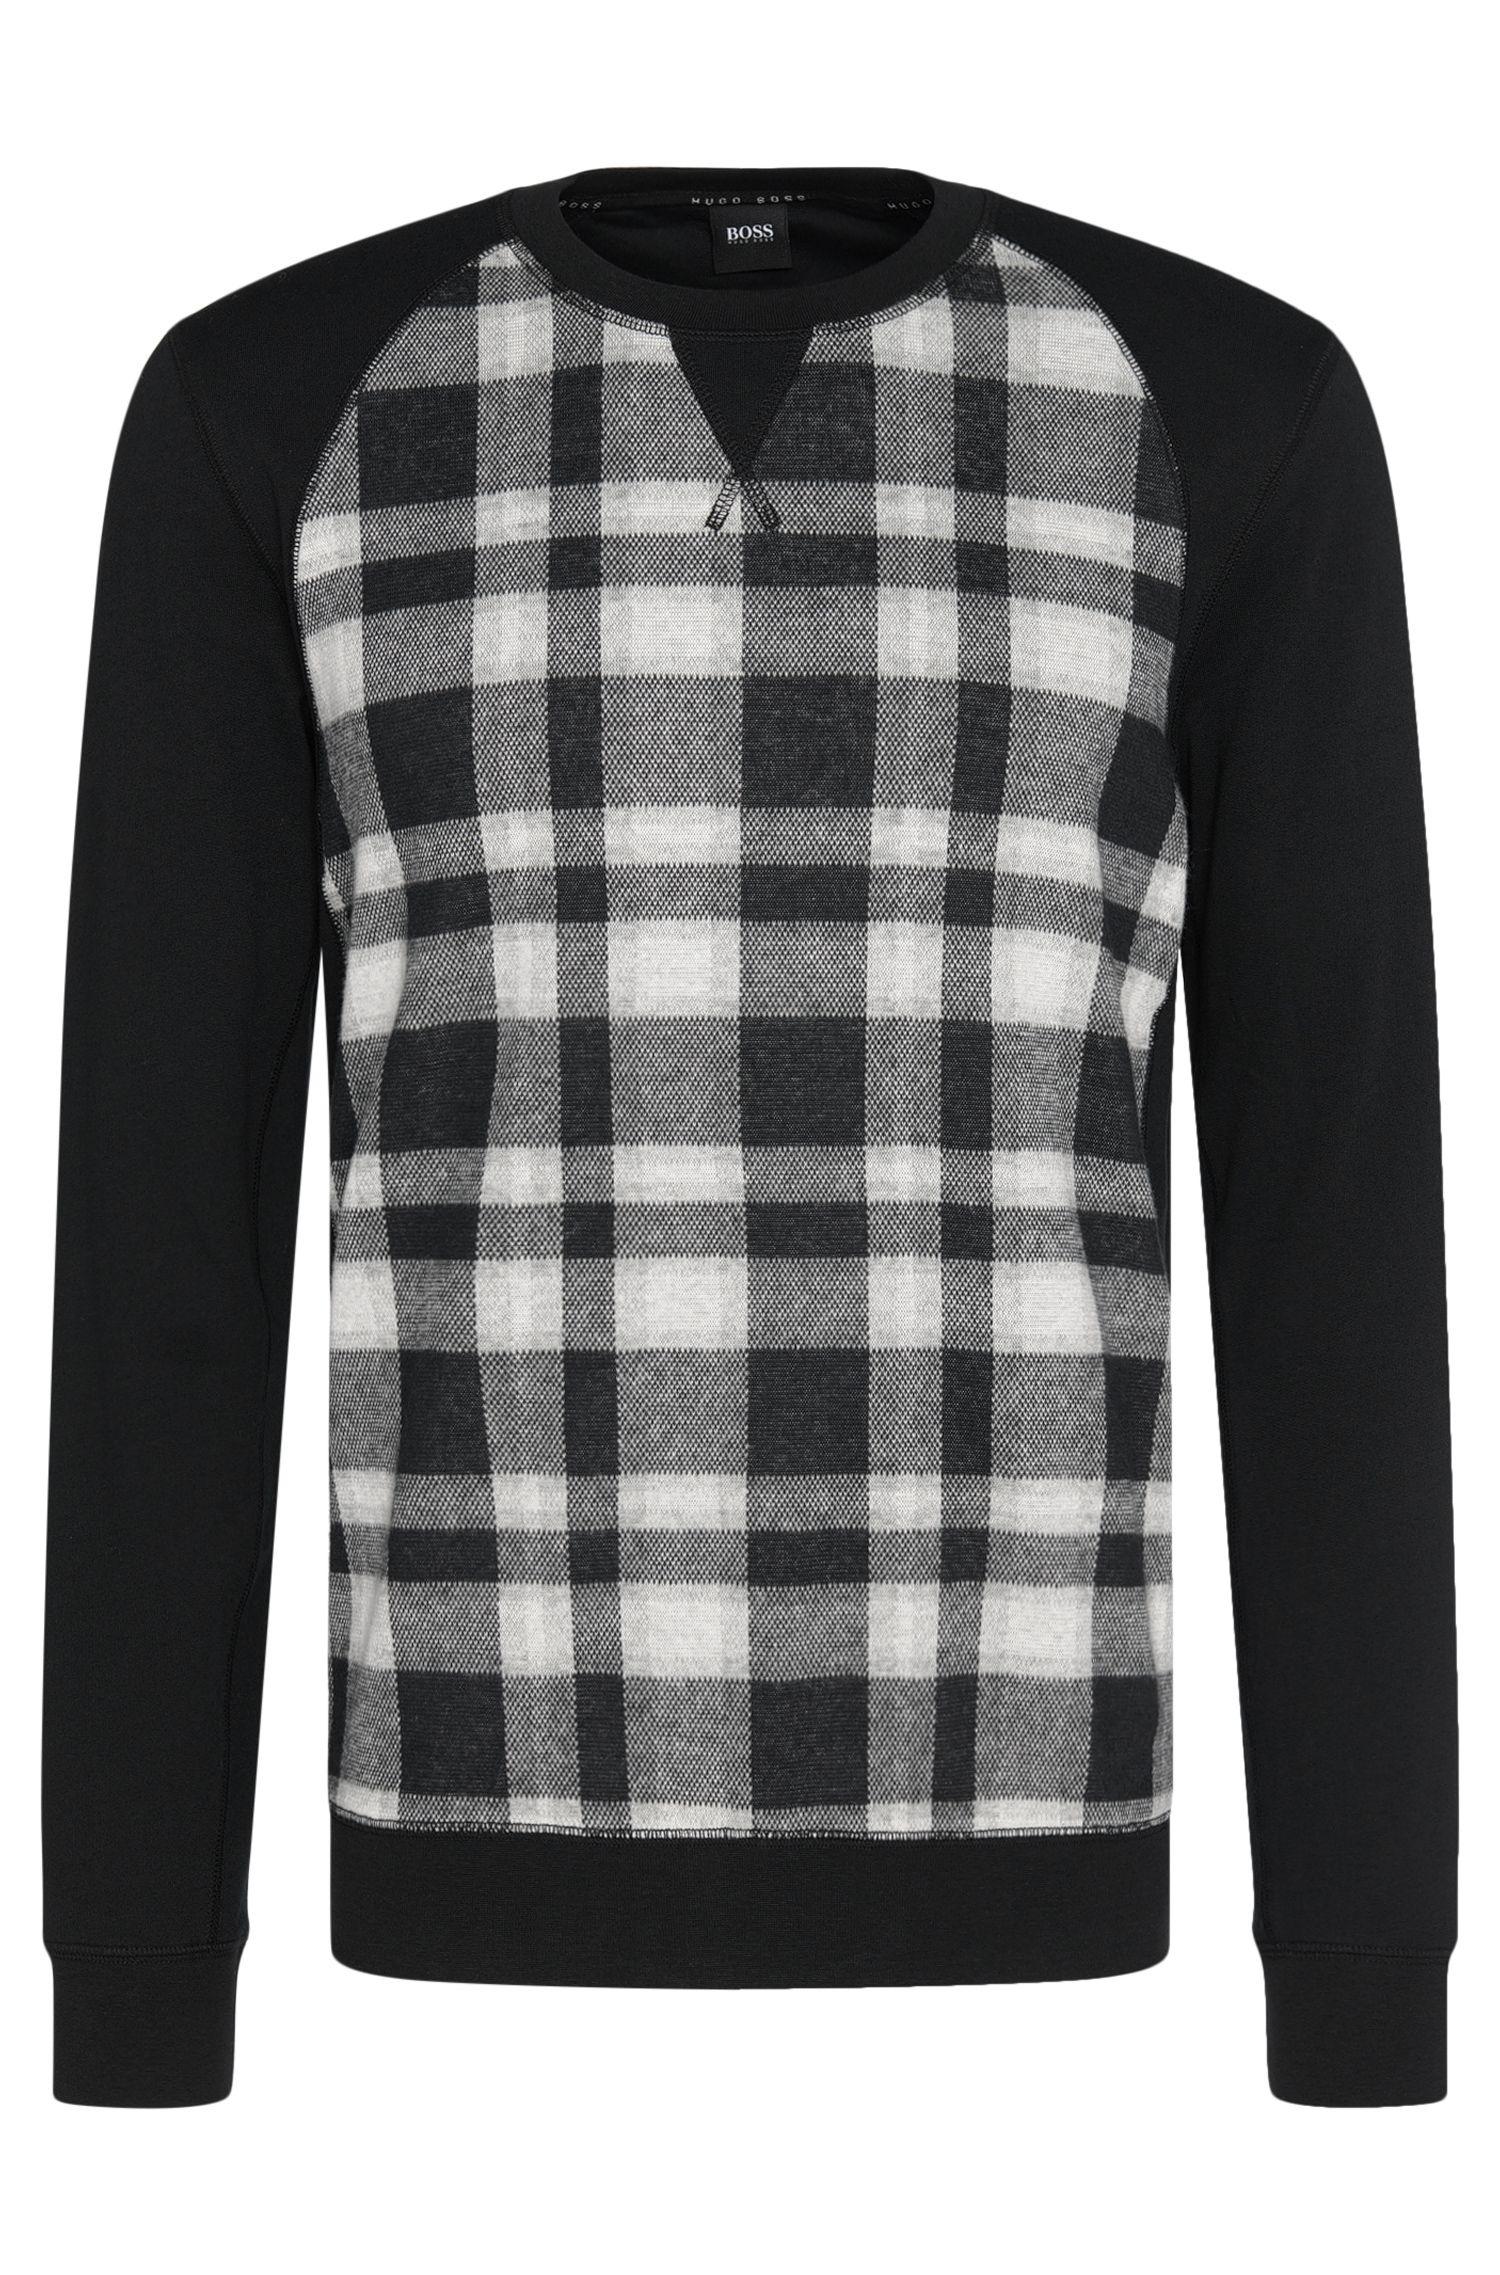 'Sweatshirt' | Cotton Plaid Sweatshirt